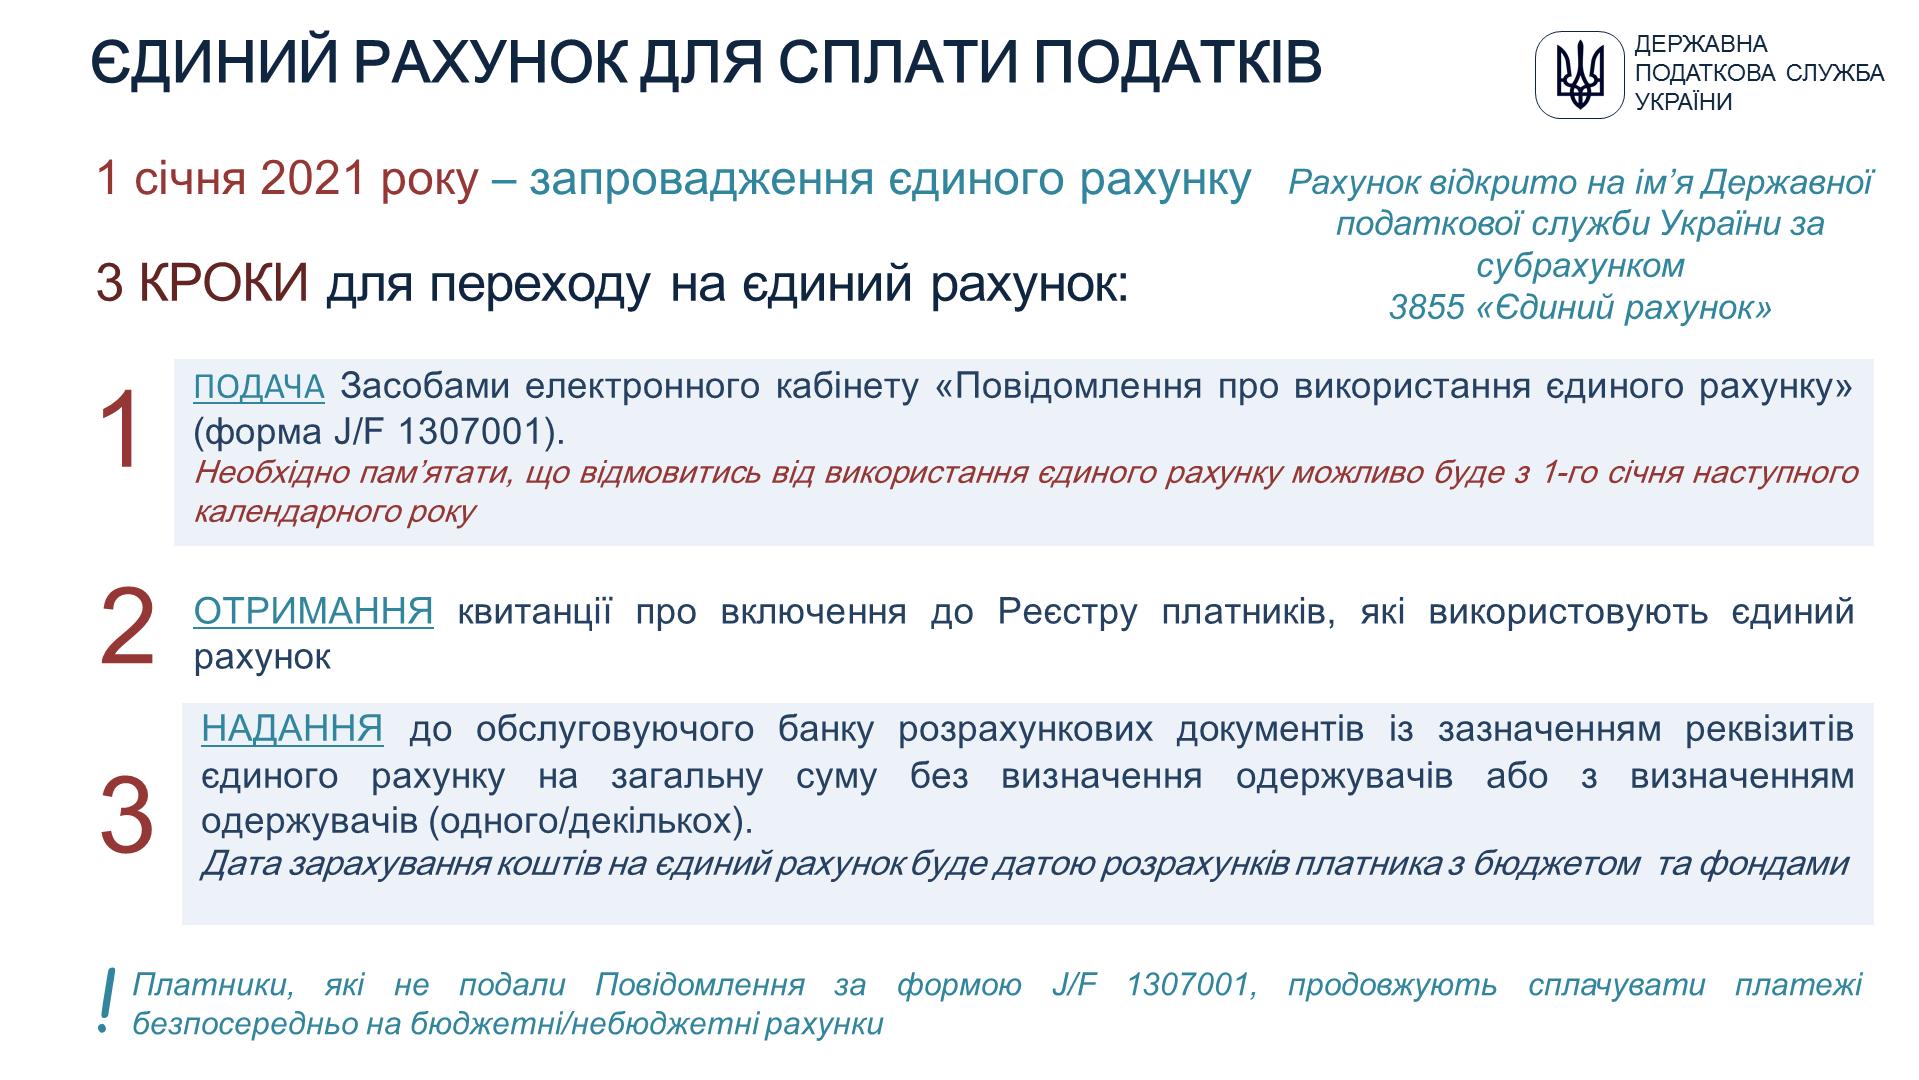 http://tax.gov.ua/data/files/253955.png